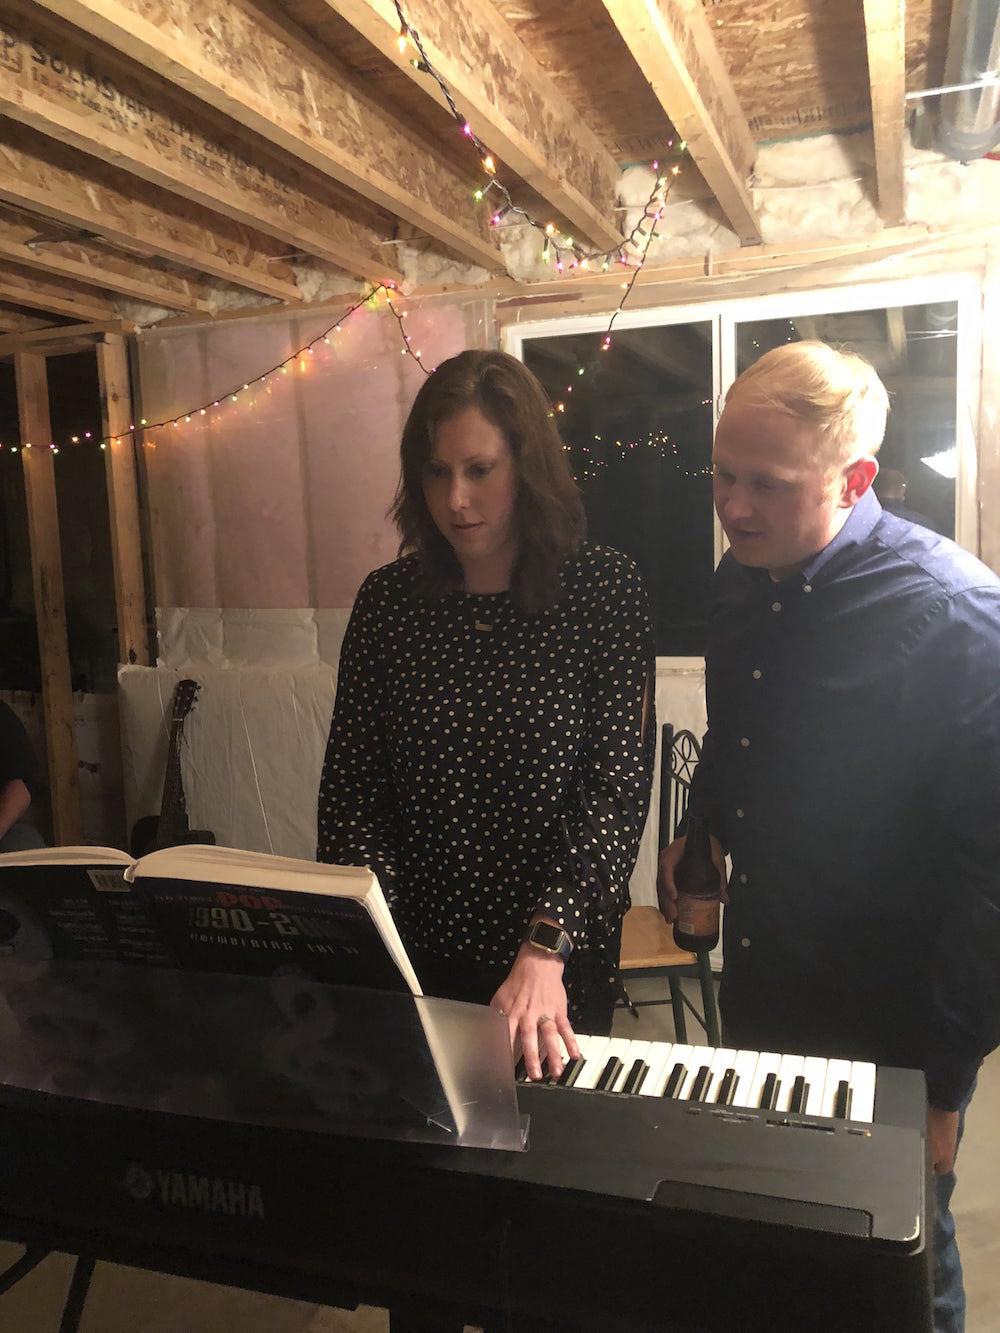 Bri and Josh playing piano and singing at the Rhinestone Theater